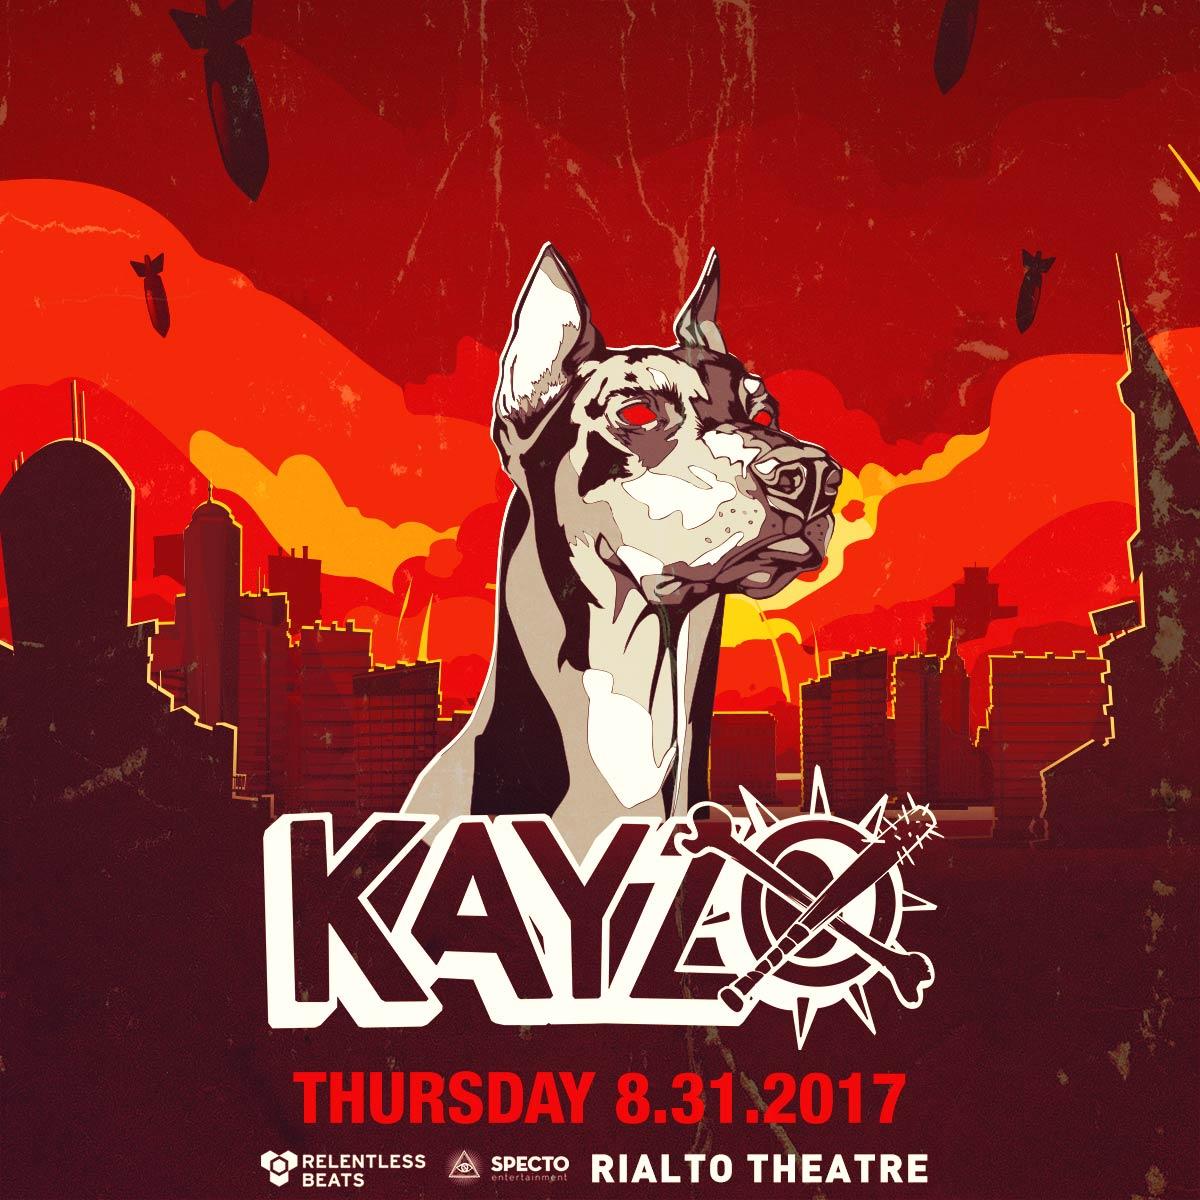 Flyer for Kayzo